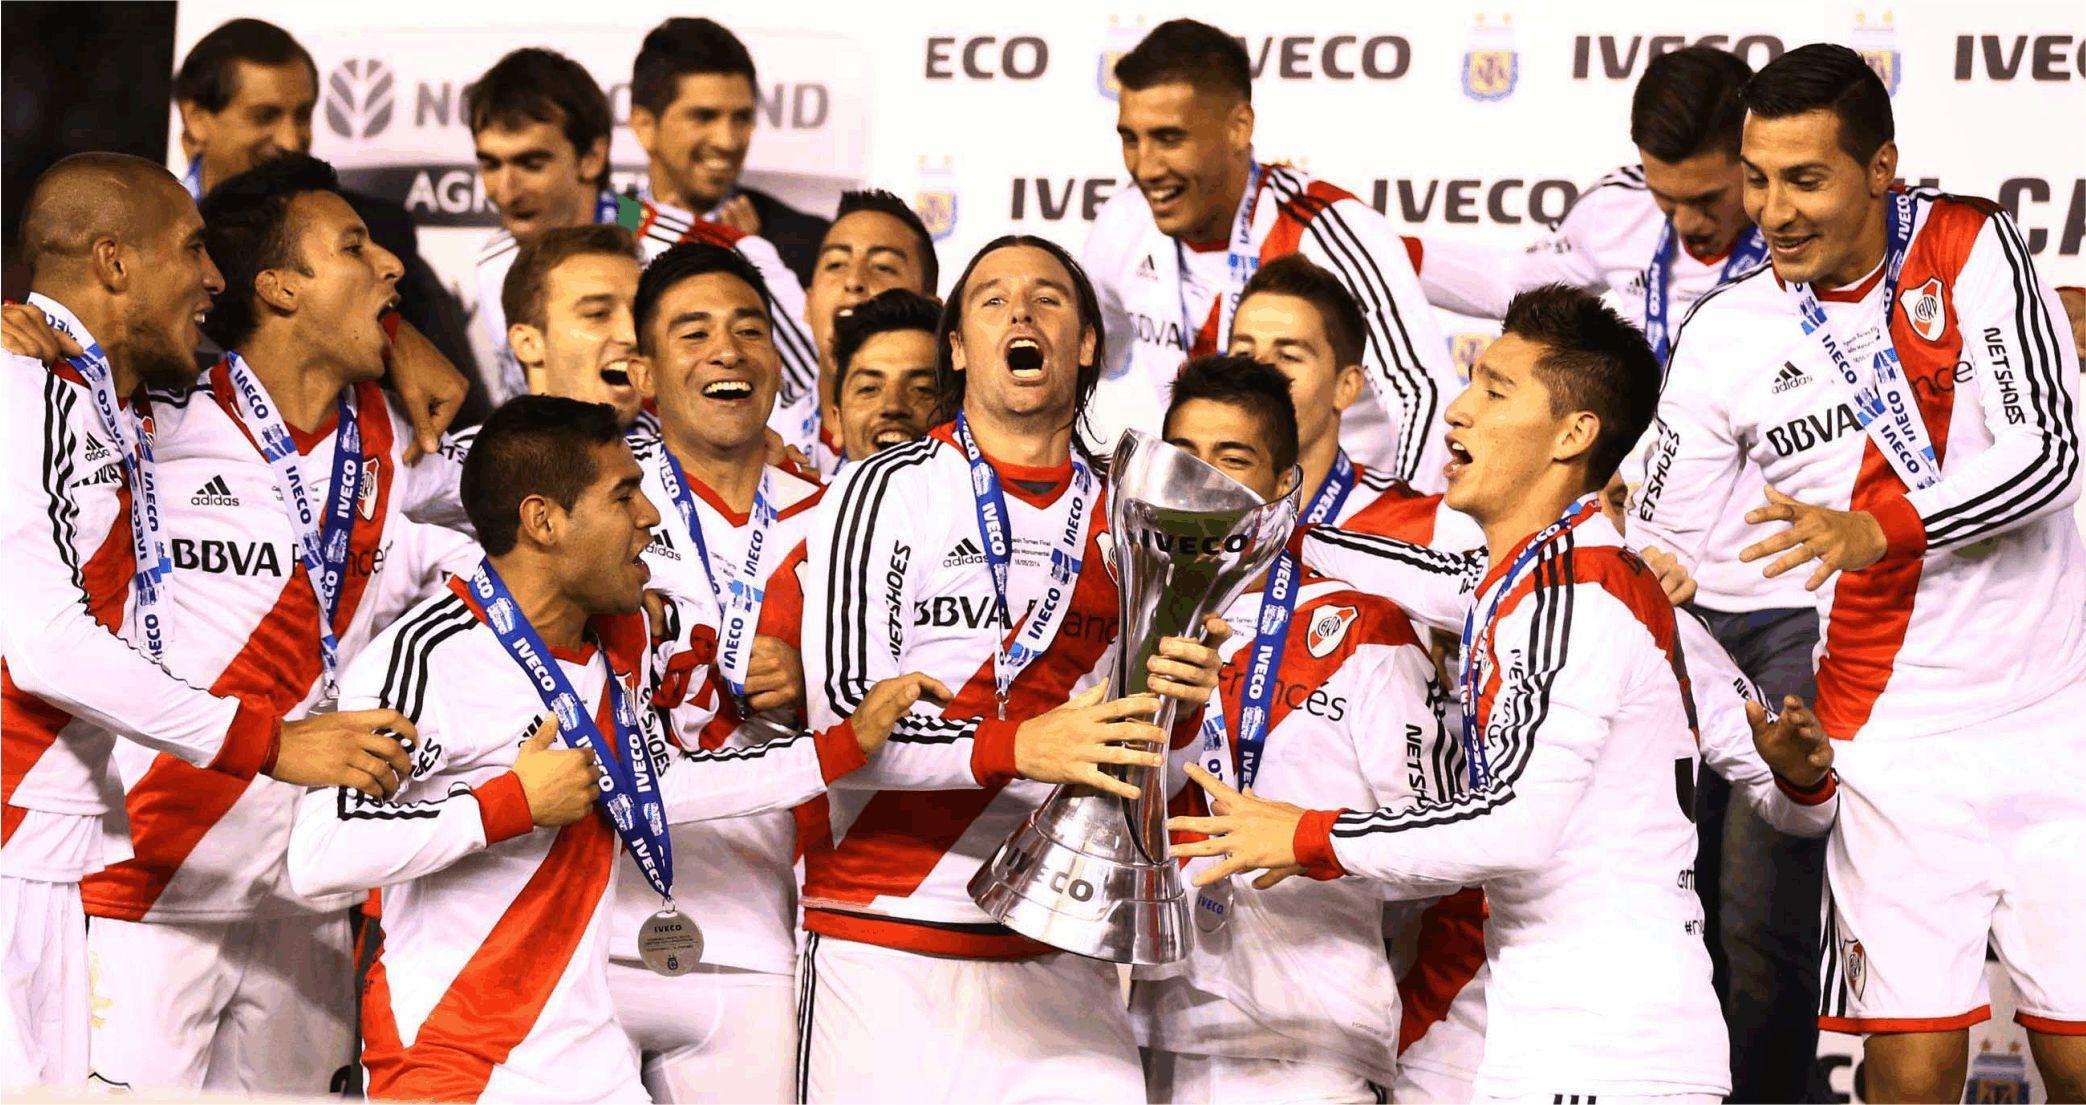 River Plate Campeón - Torneo Final 2014